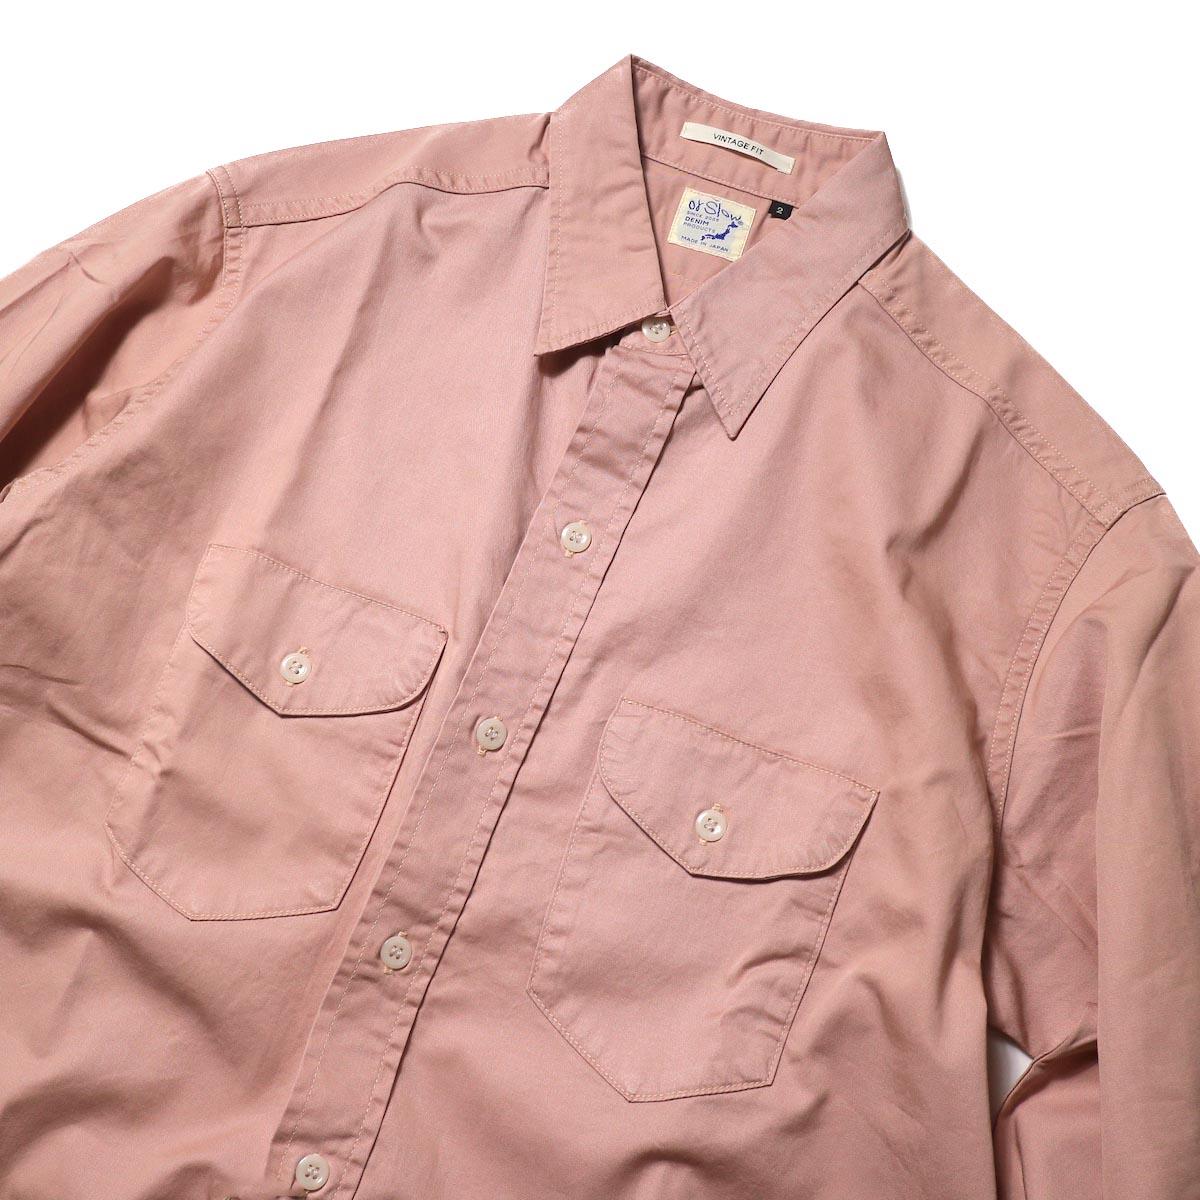 orSlow / UTILITY WORK SHIRT (Pink)襟